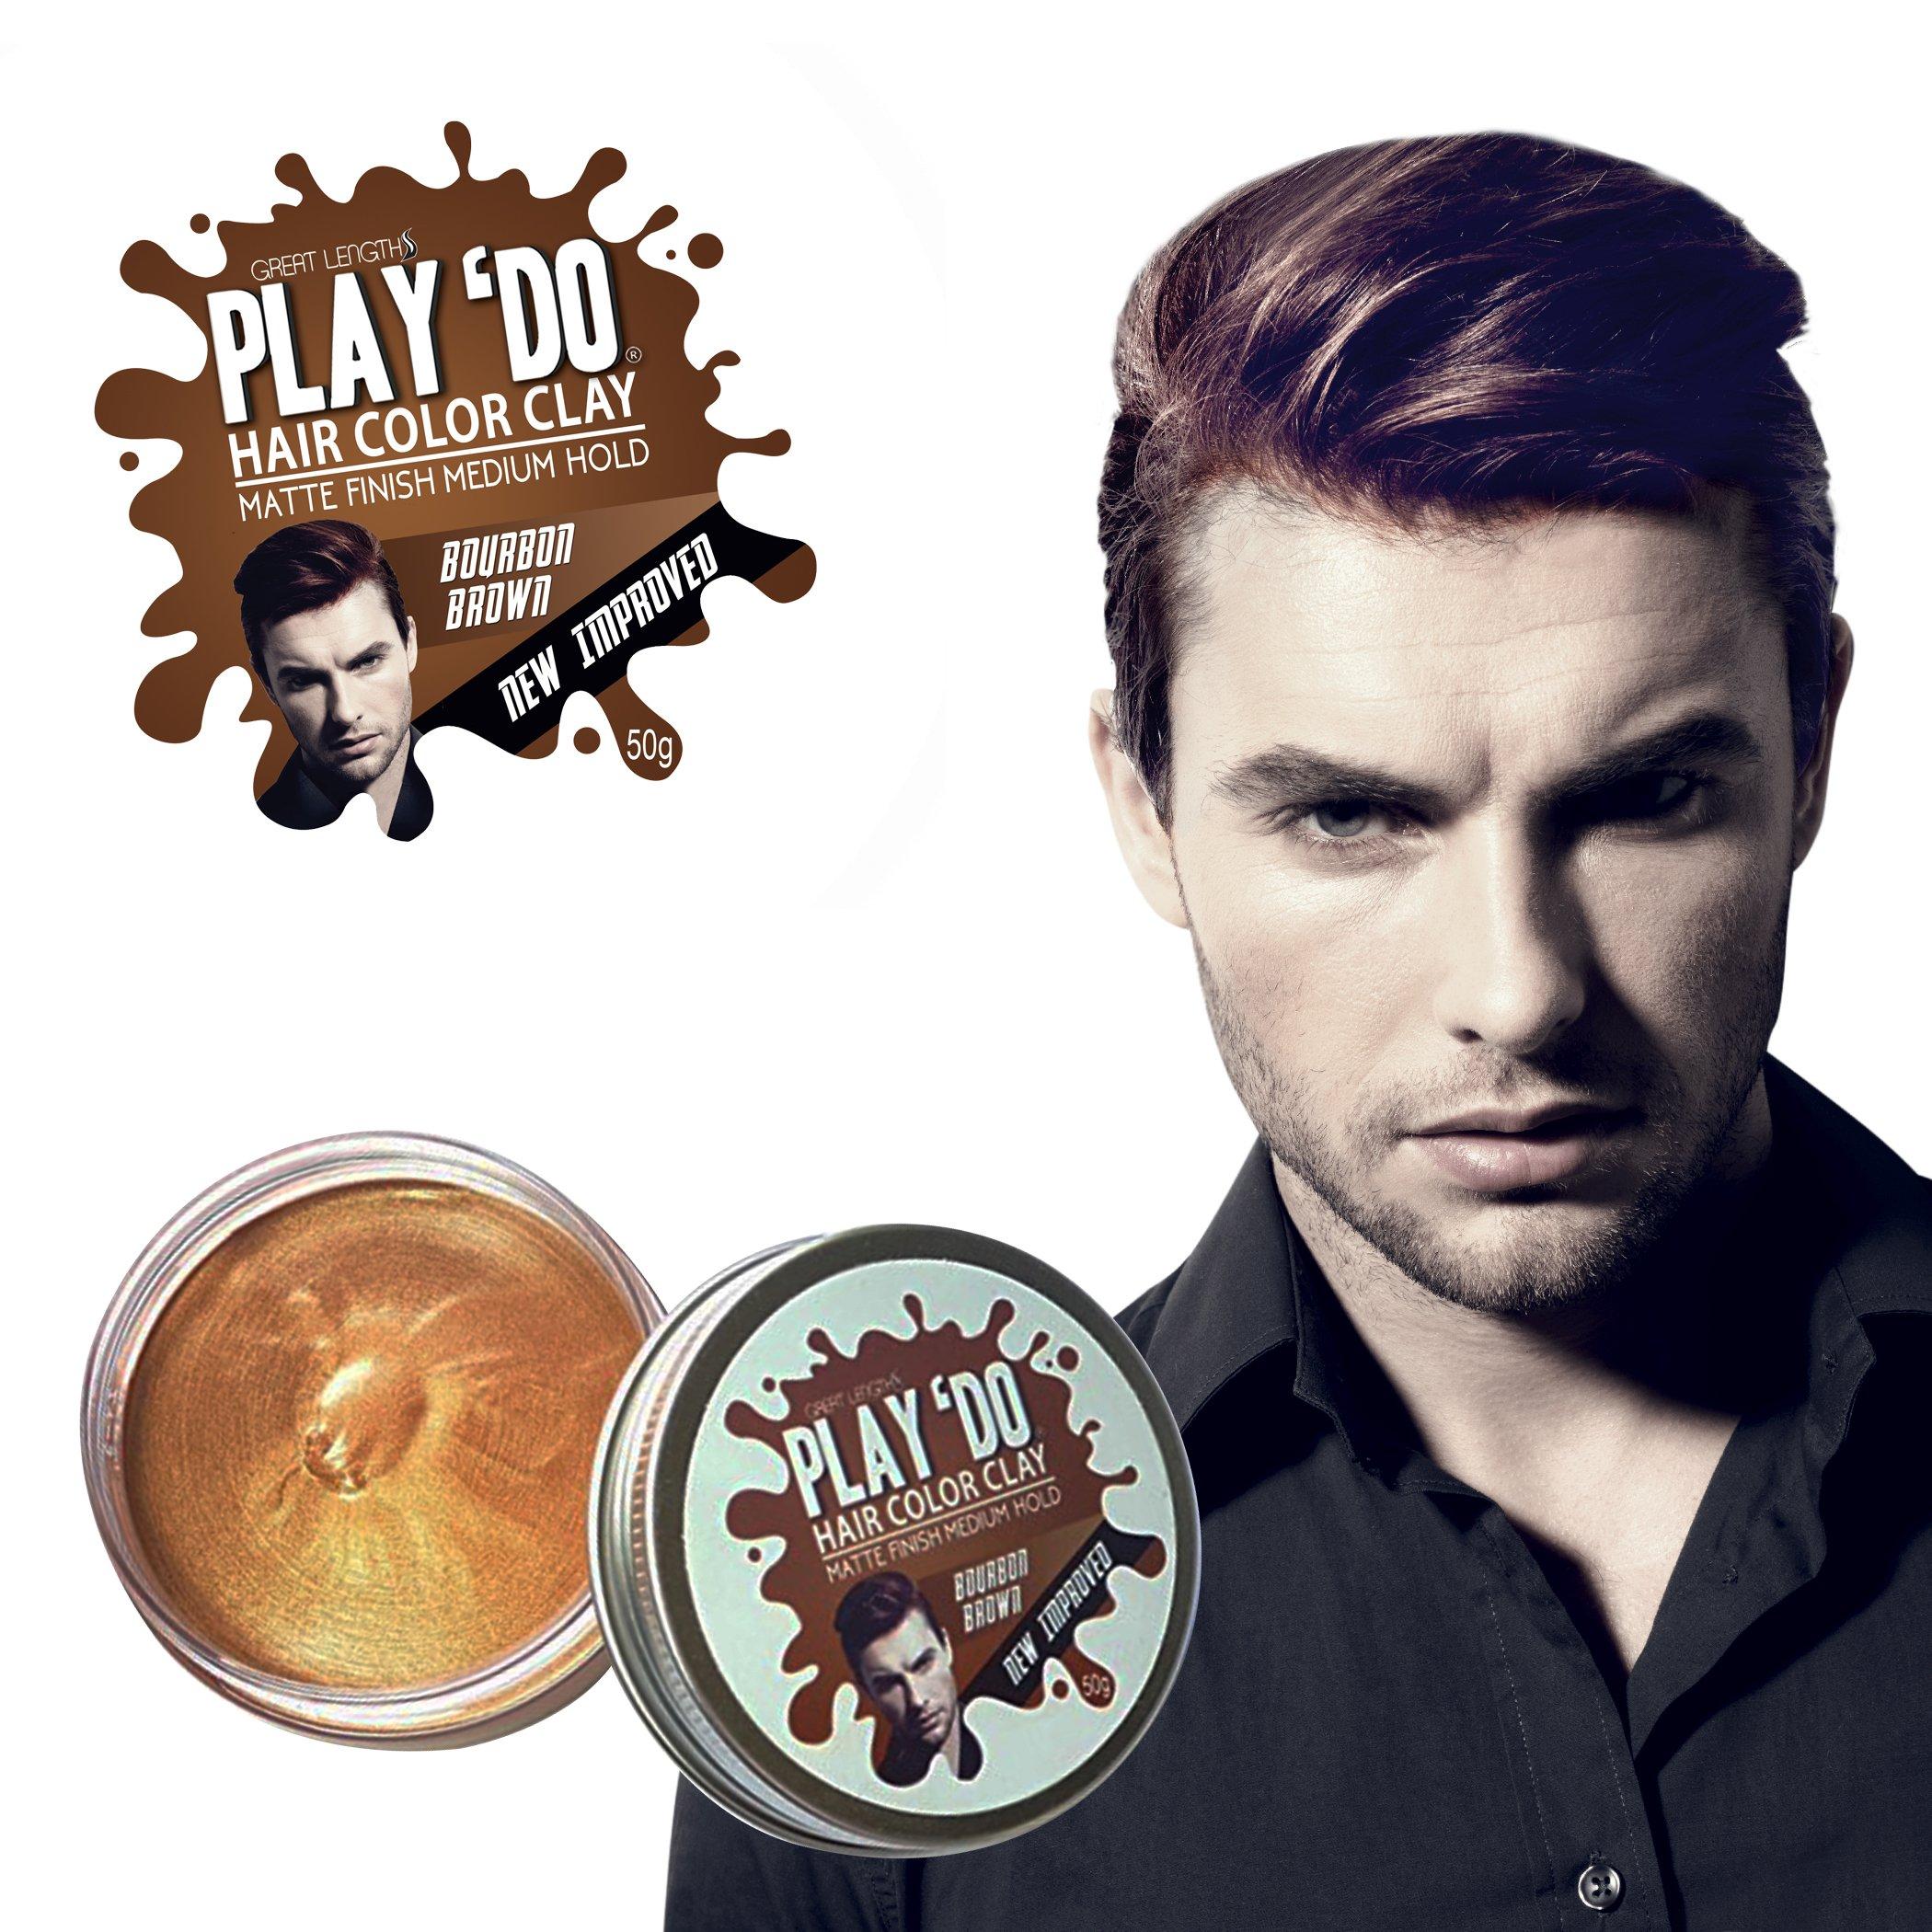 Play 'Do Temporary Hair Color, Hair Wax, Hair Clay, Mens Grooming, Brown hair dye(1.8 ounces)